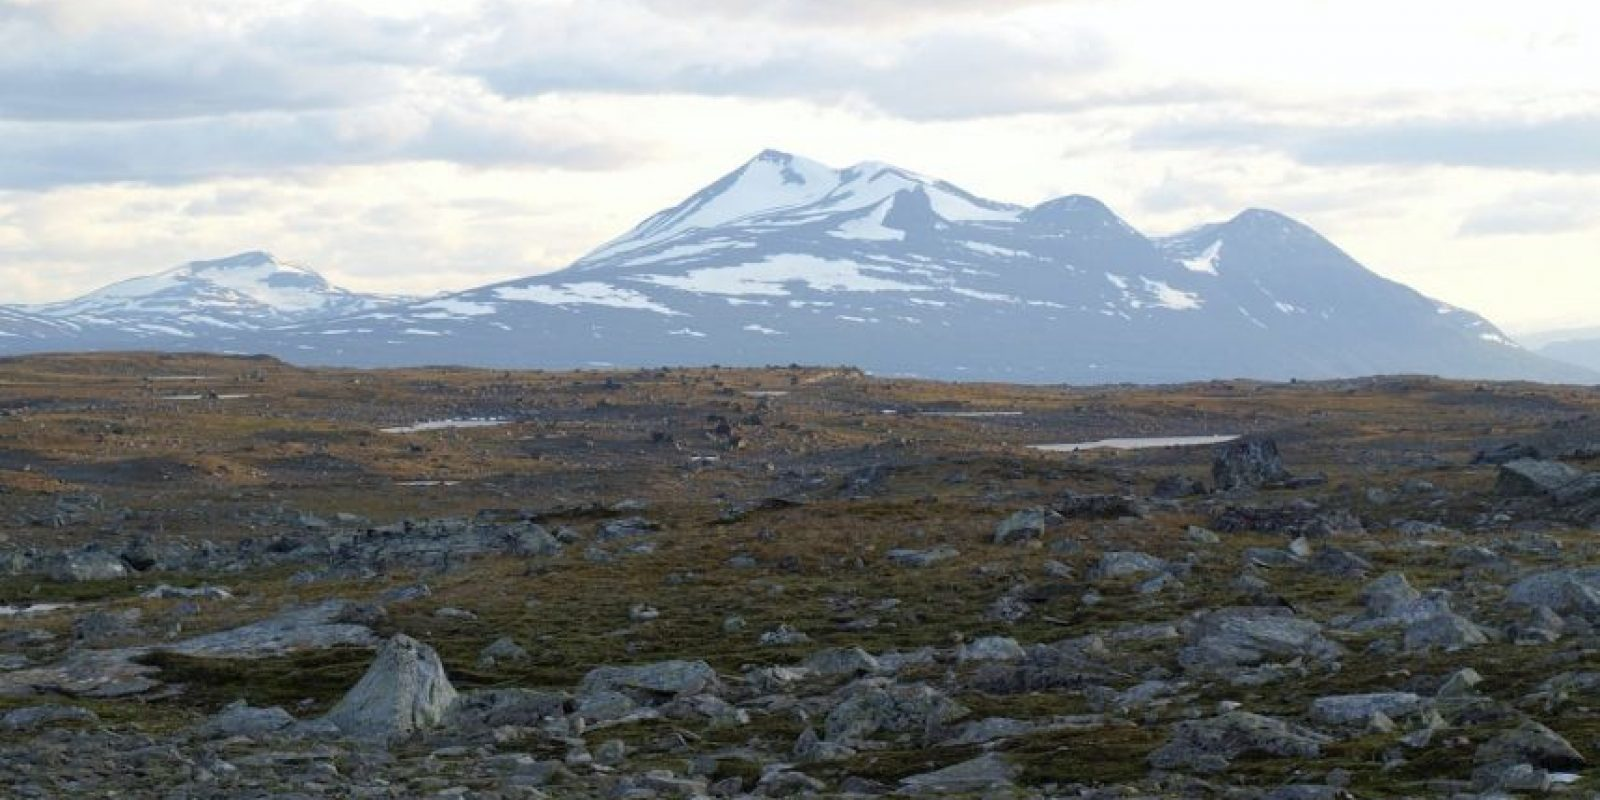 PAra llegar a este punto hay que caminar cerca de 50 kilómetros Foto:Wikimedia